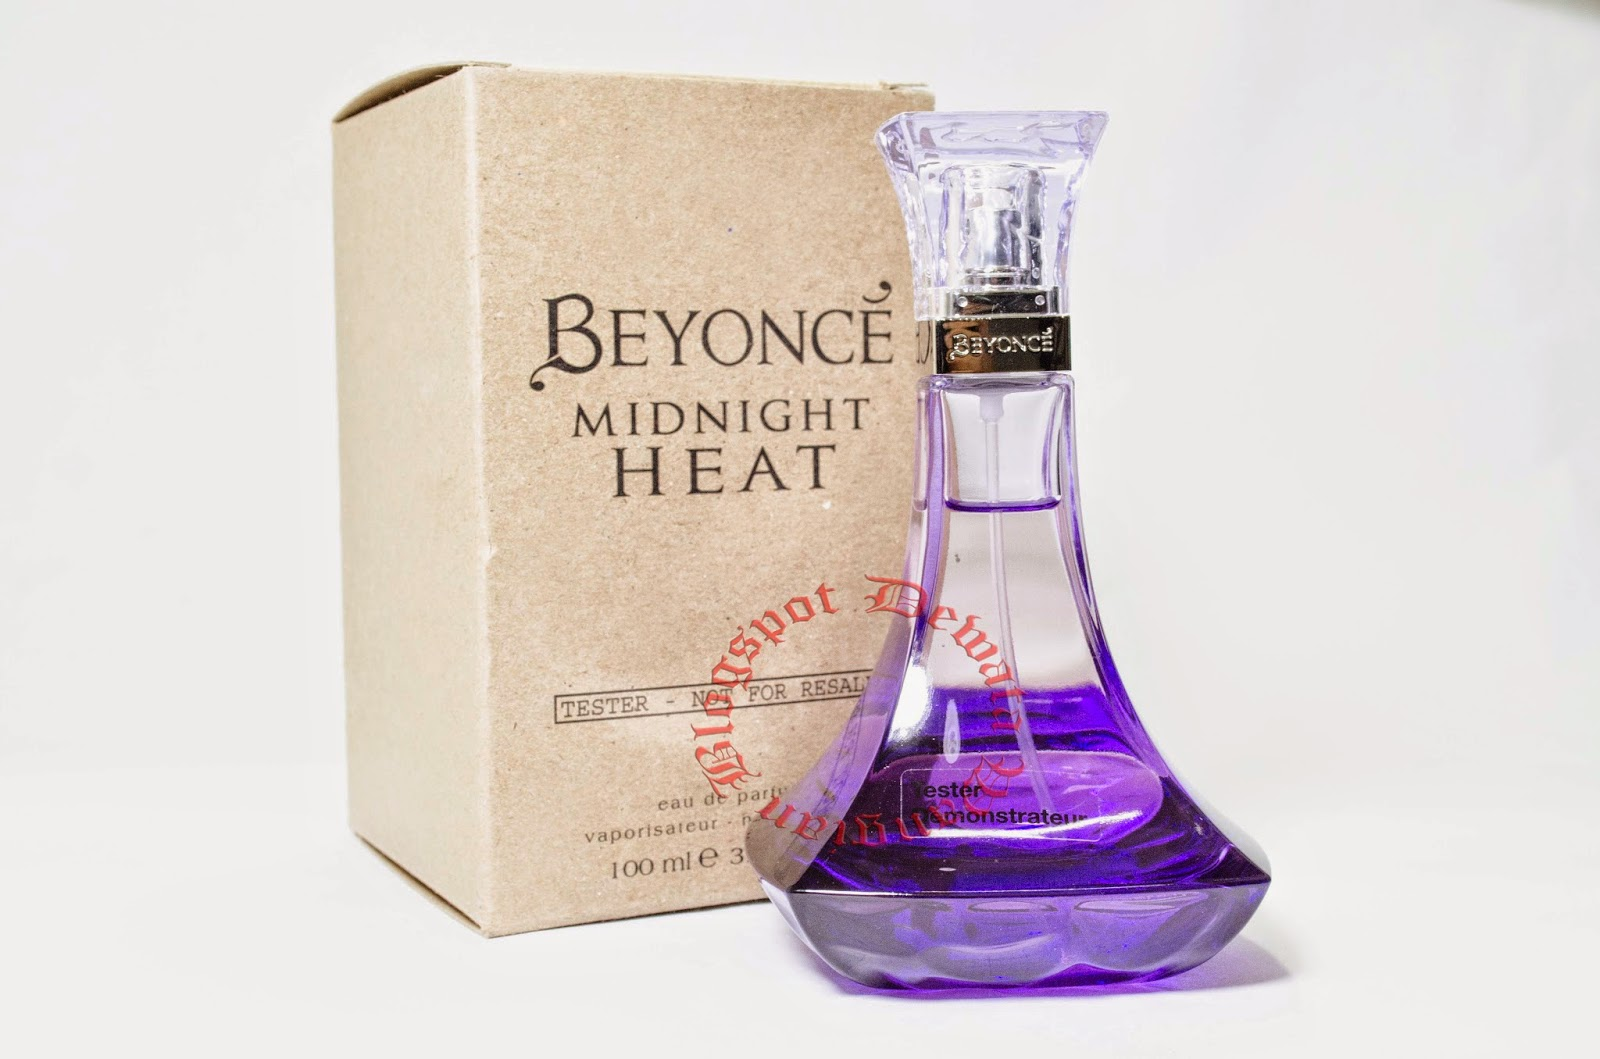 Beyoncé Midnight Heat Tester Perfume